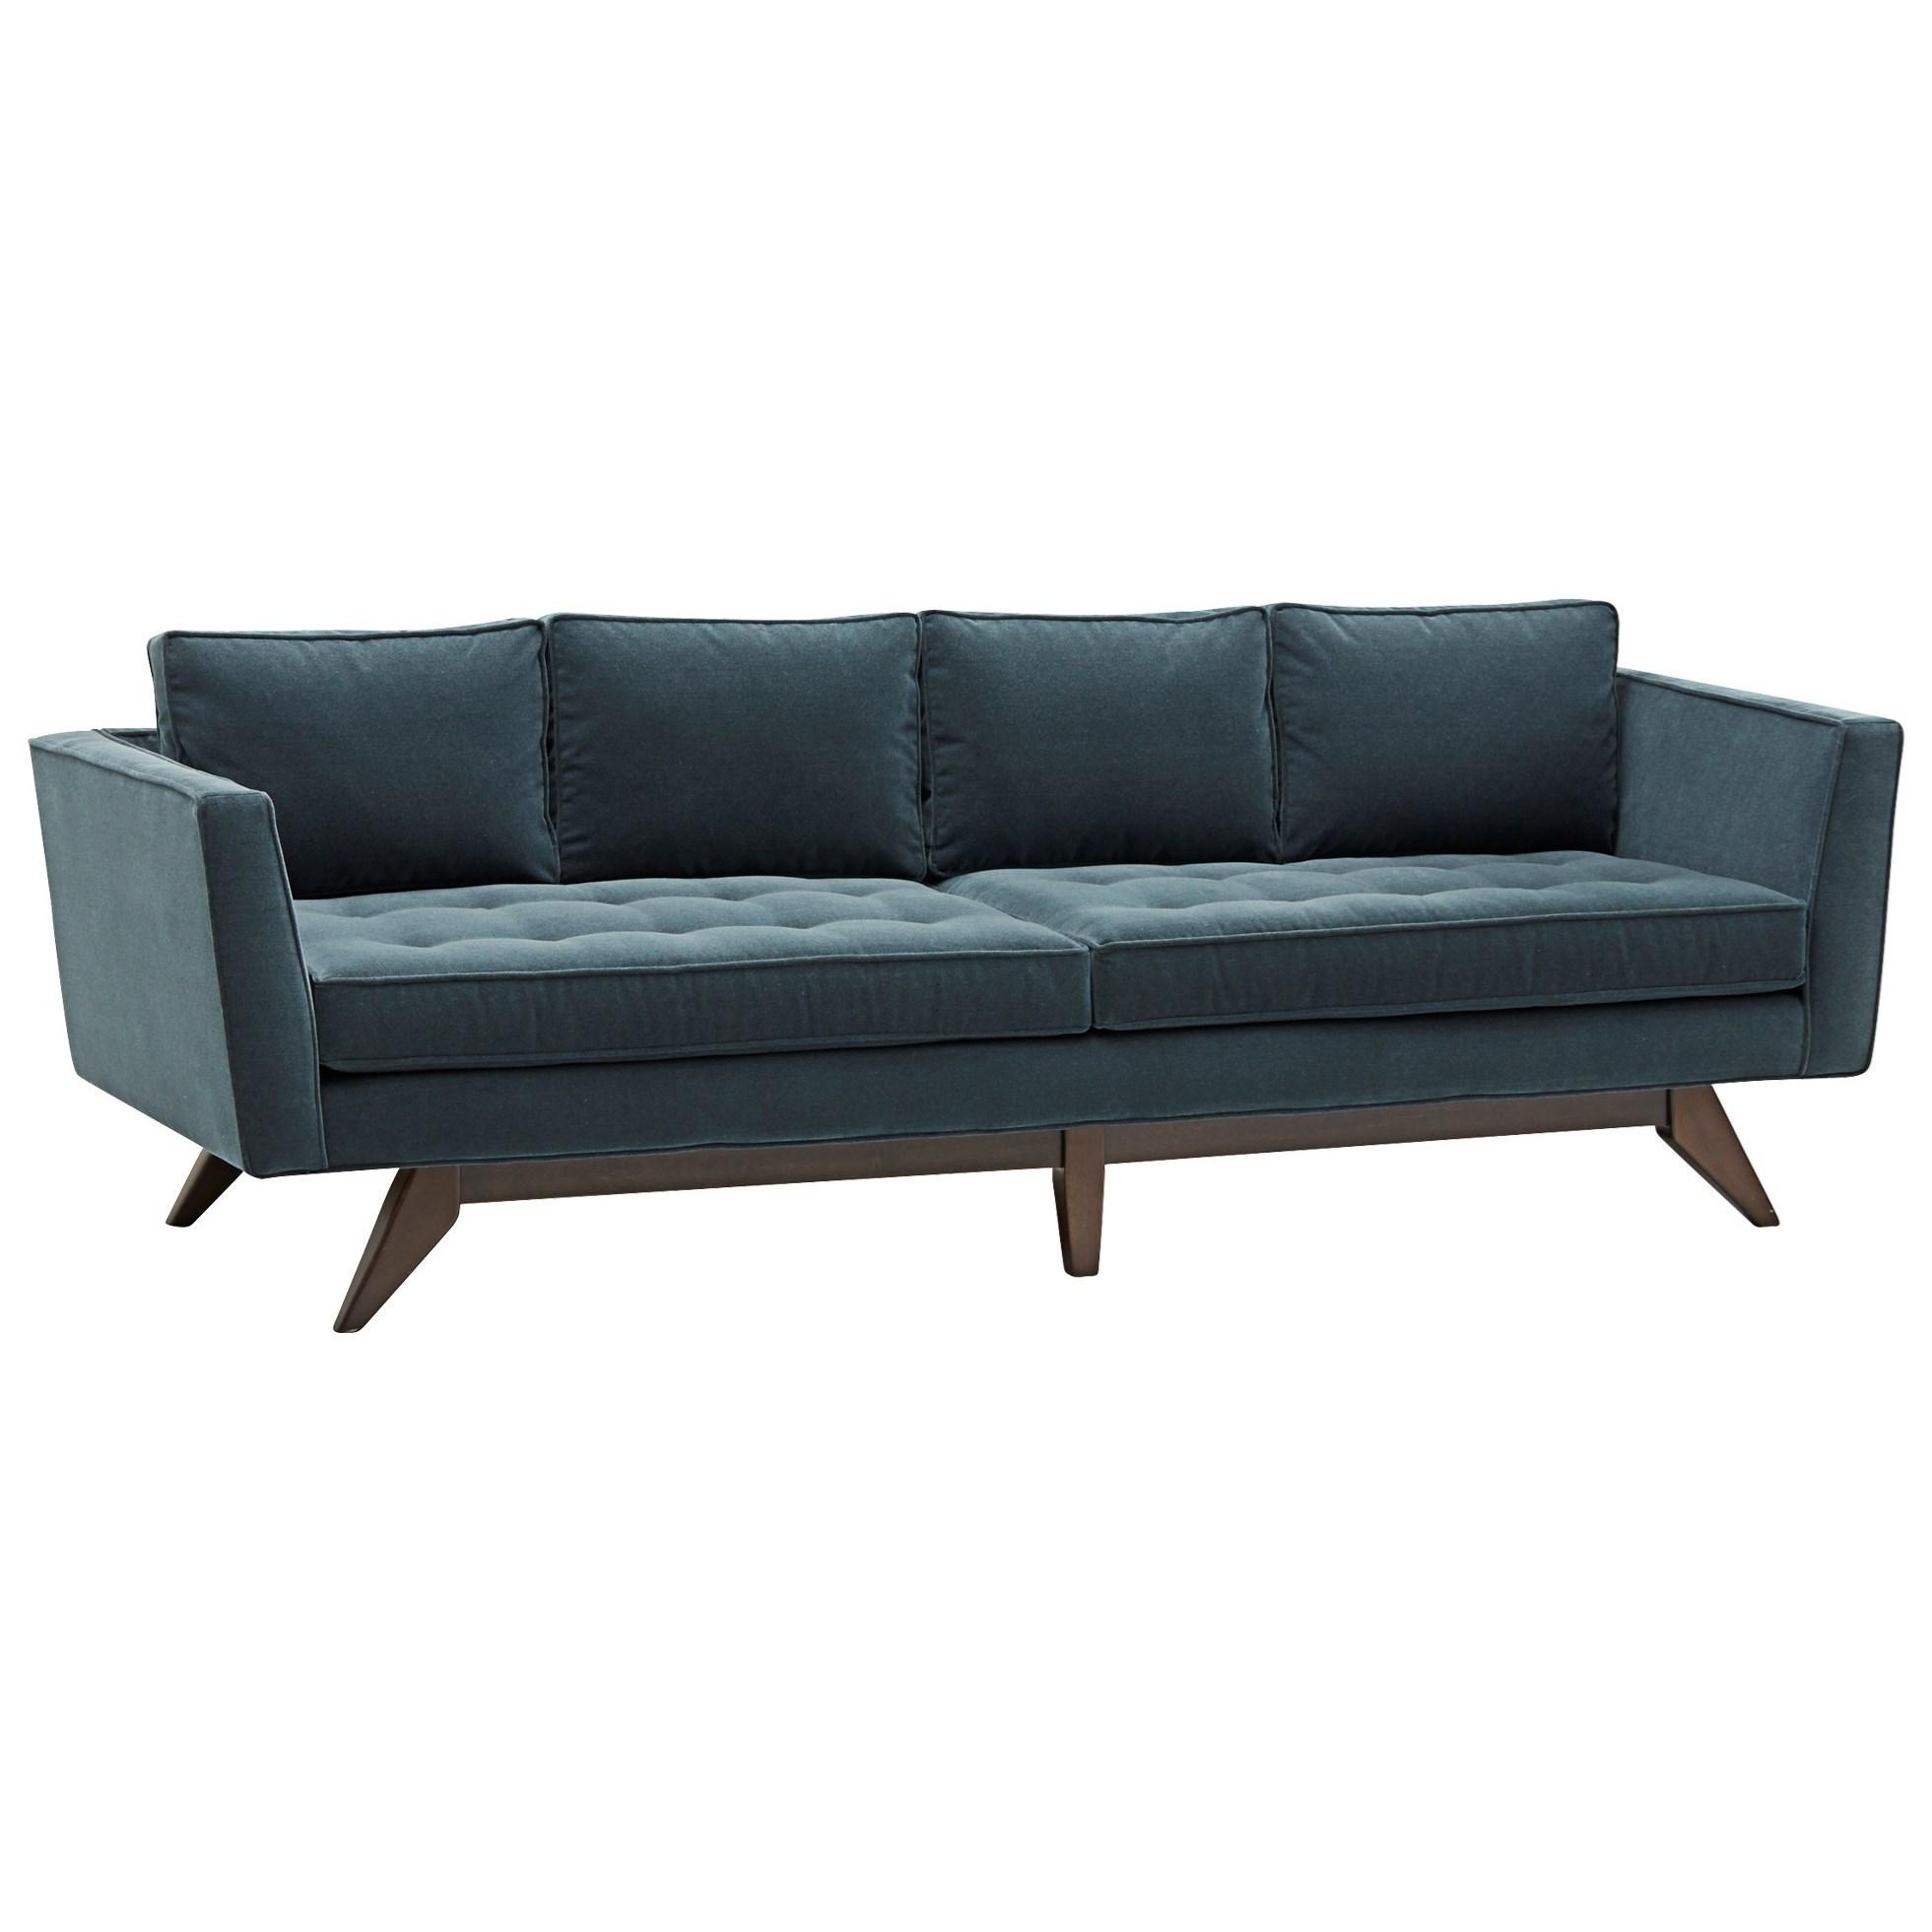 angled sofa legs window design klaussner fairfax mid century modern style with